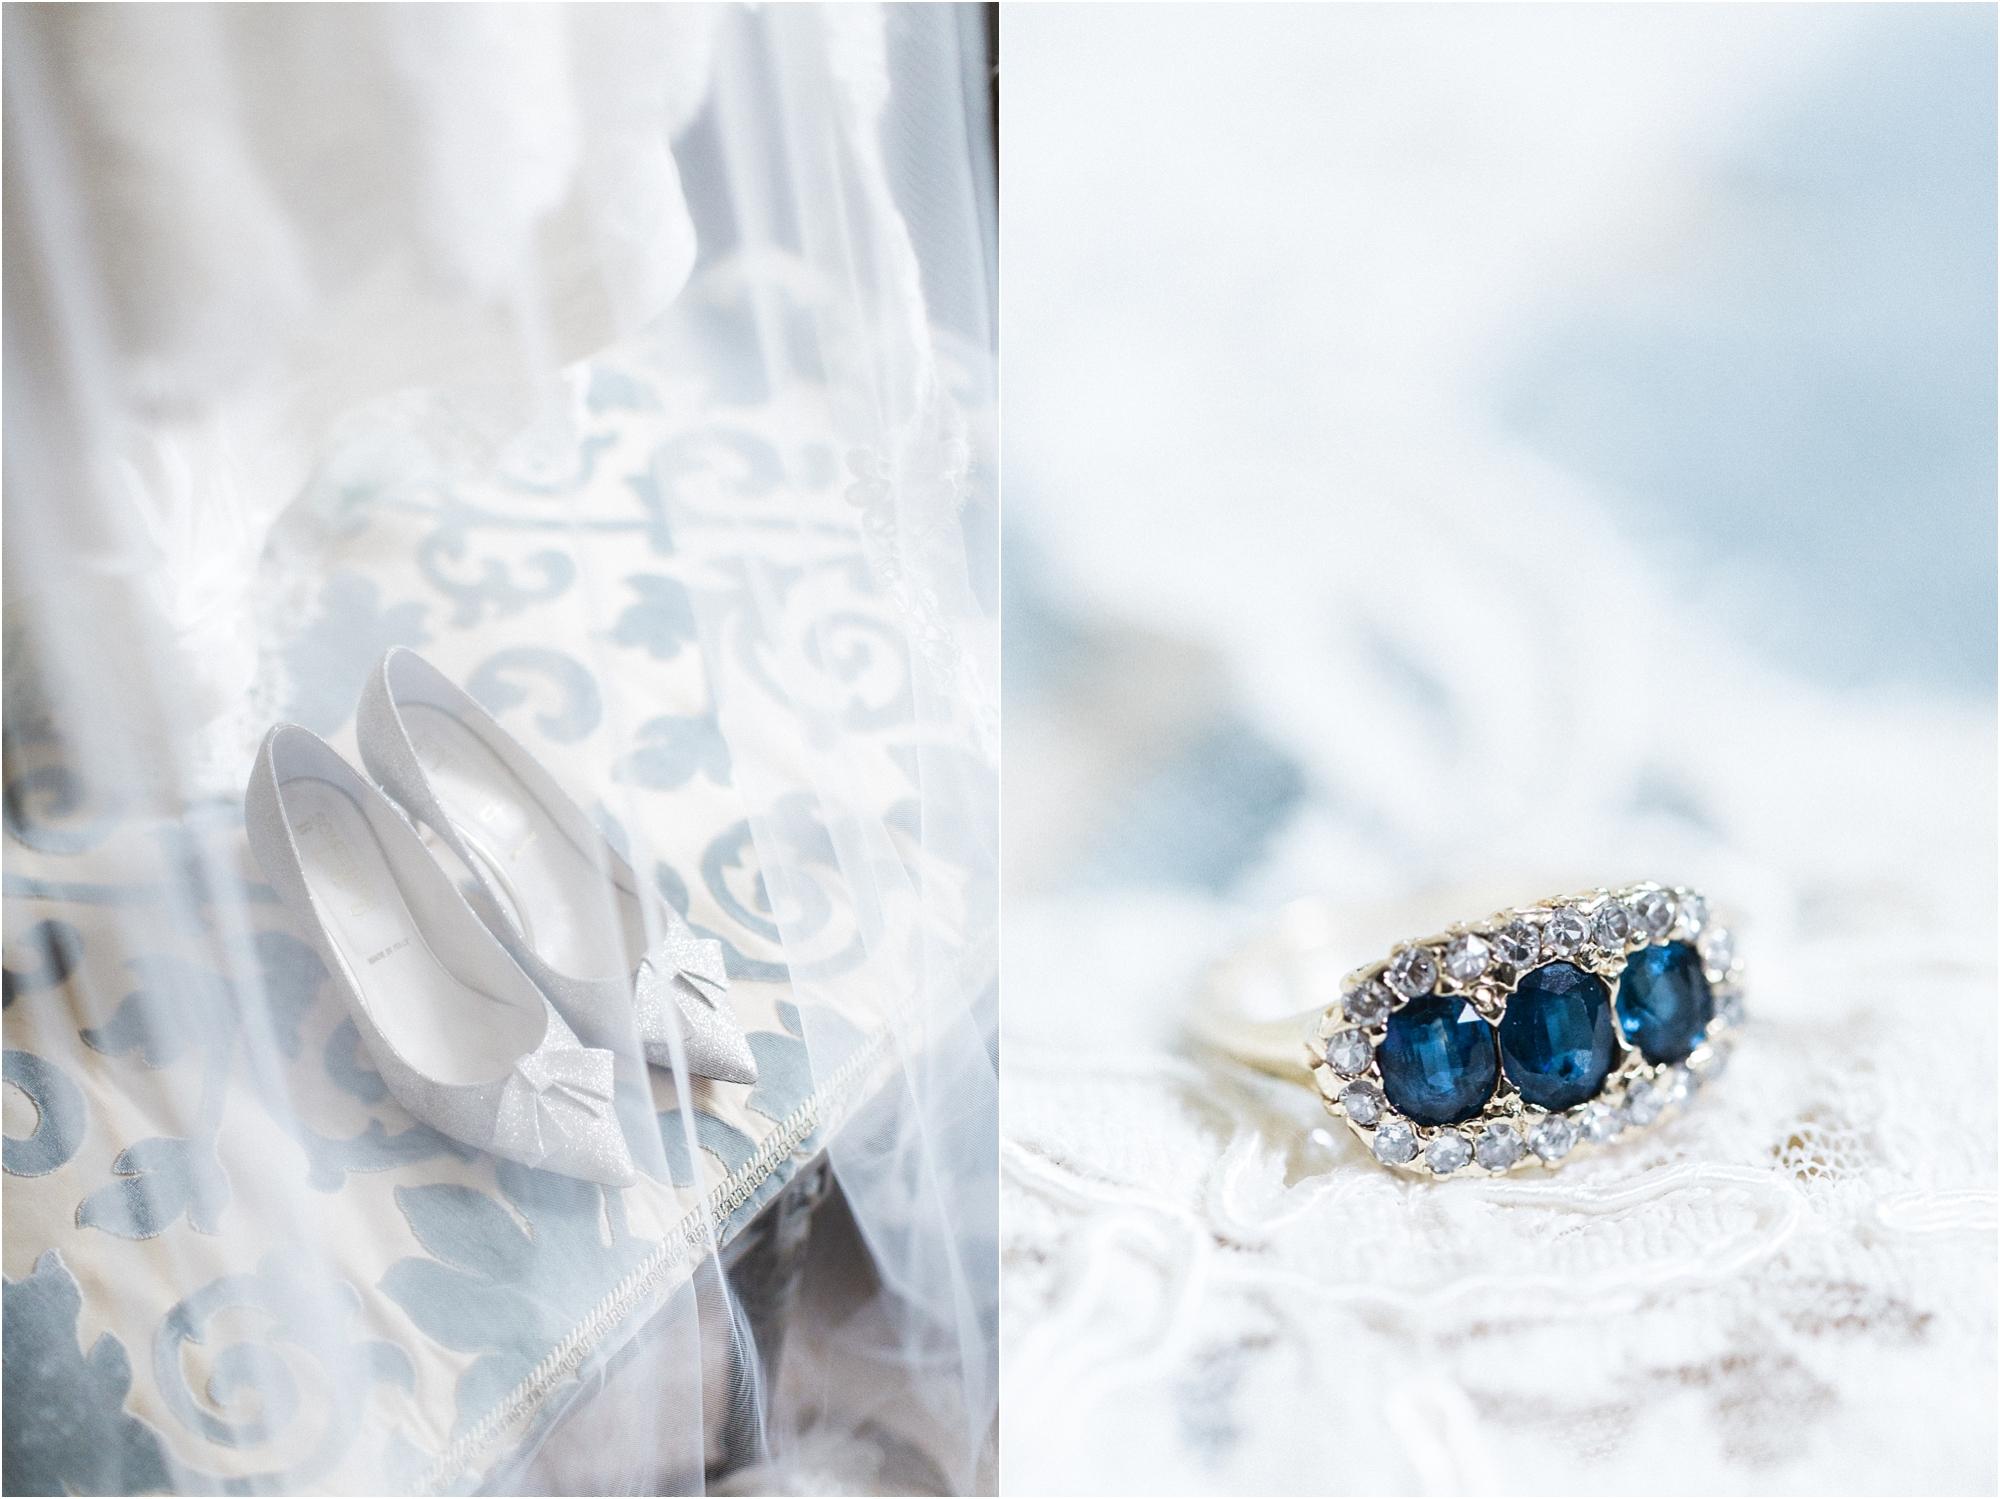 stephanie-yonce-photography-richmond-virginia-country-club-wedding-photo_004.JPG